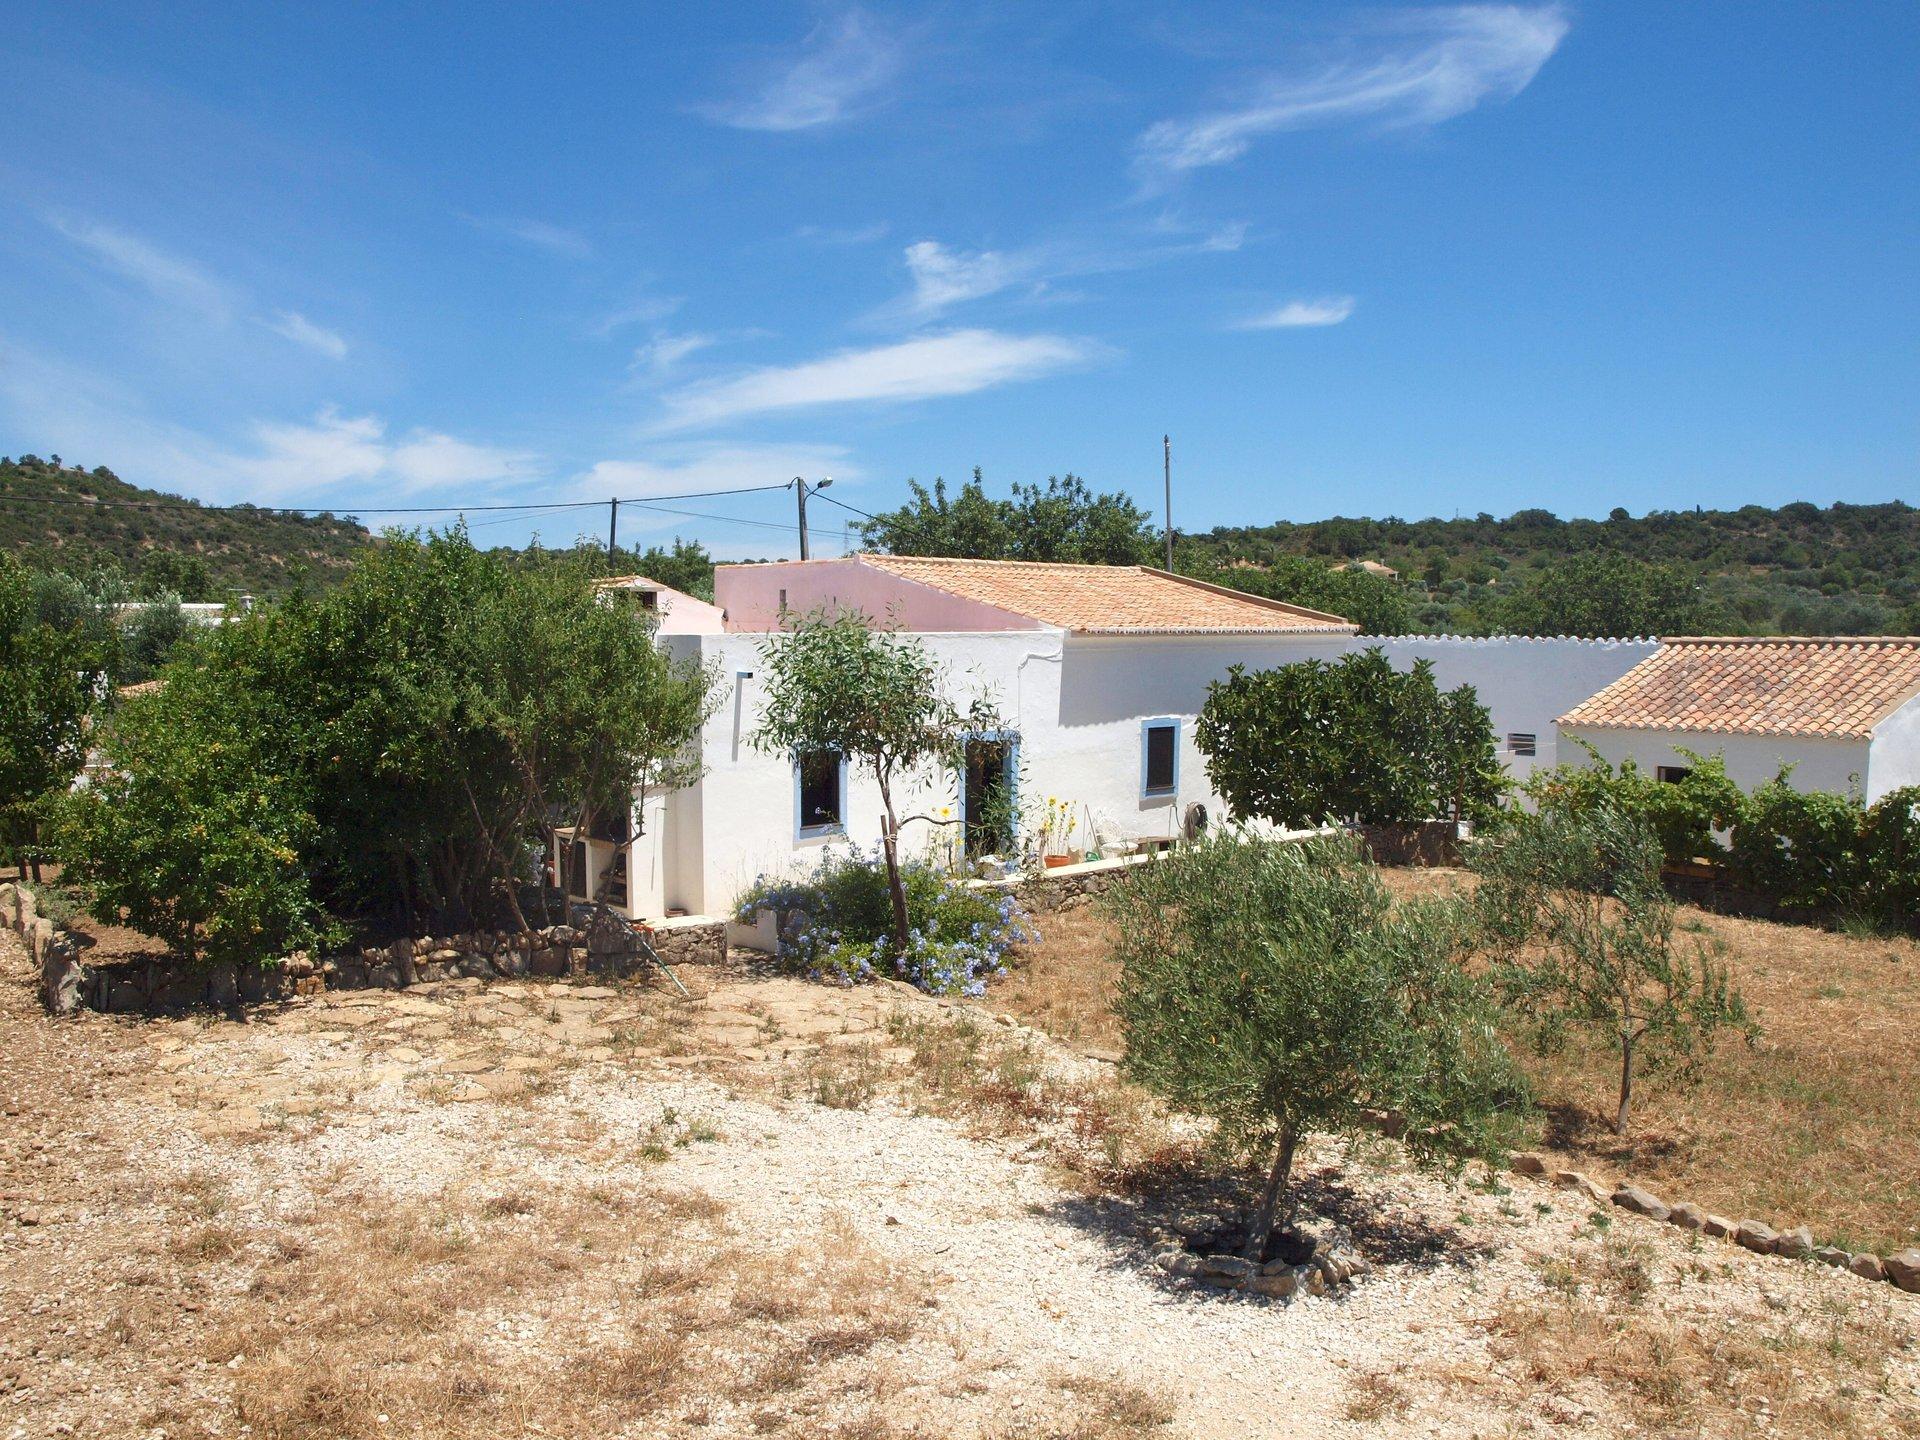 5 Bedroom House Estoi, Central Algarve Ref: RV5448